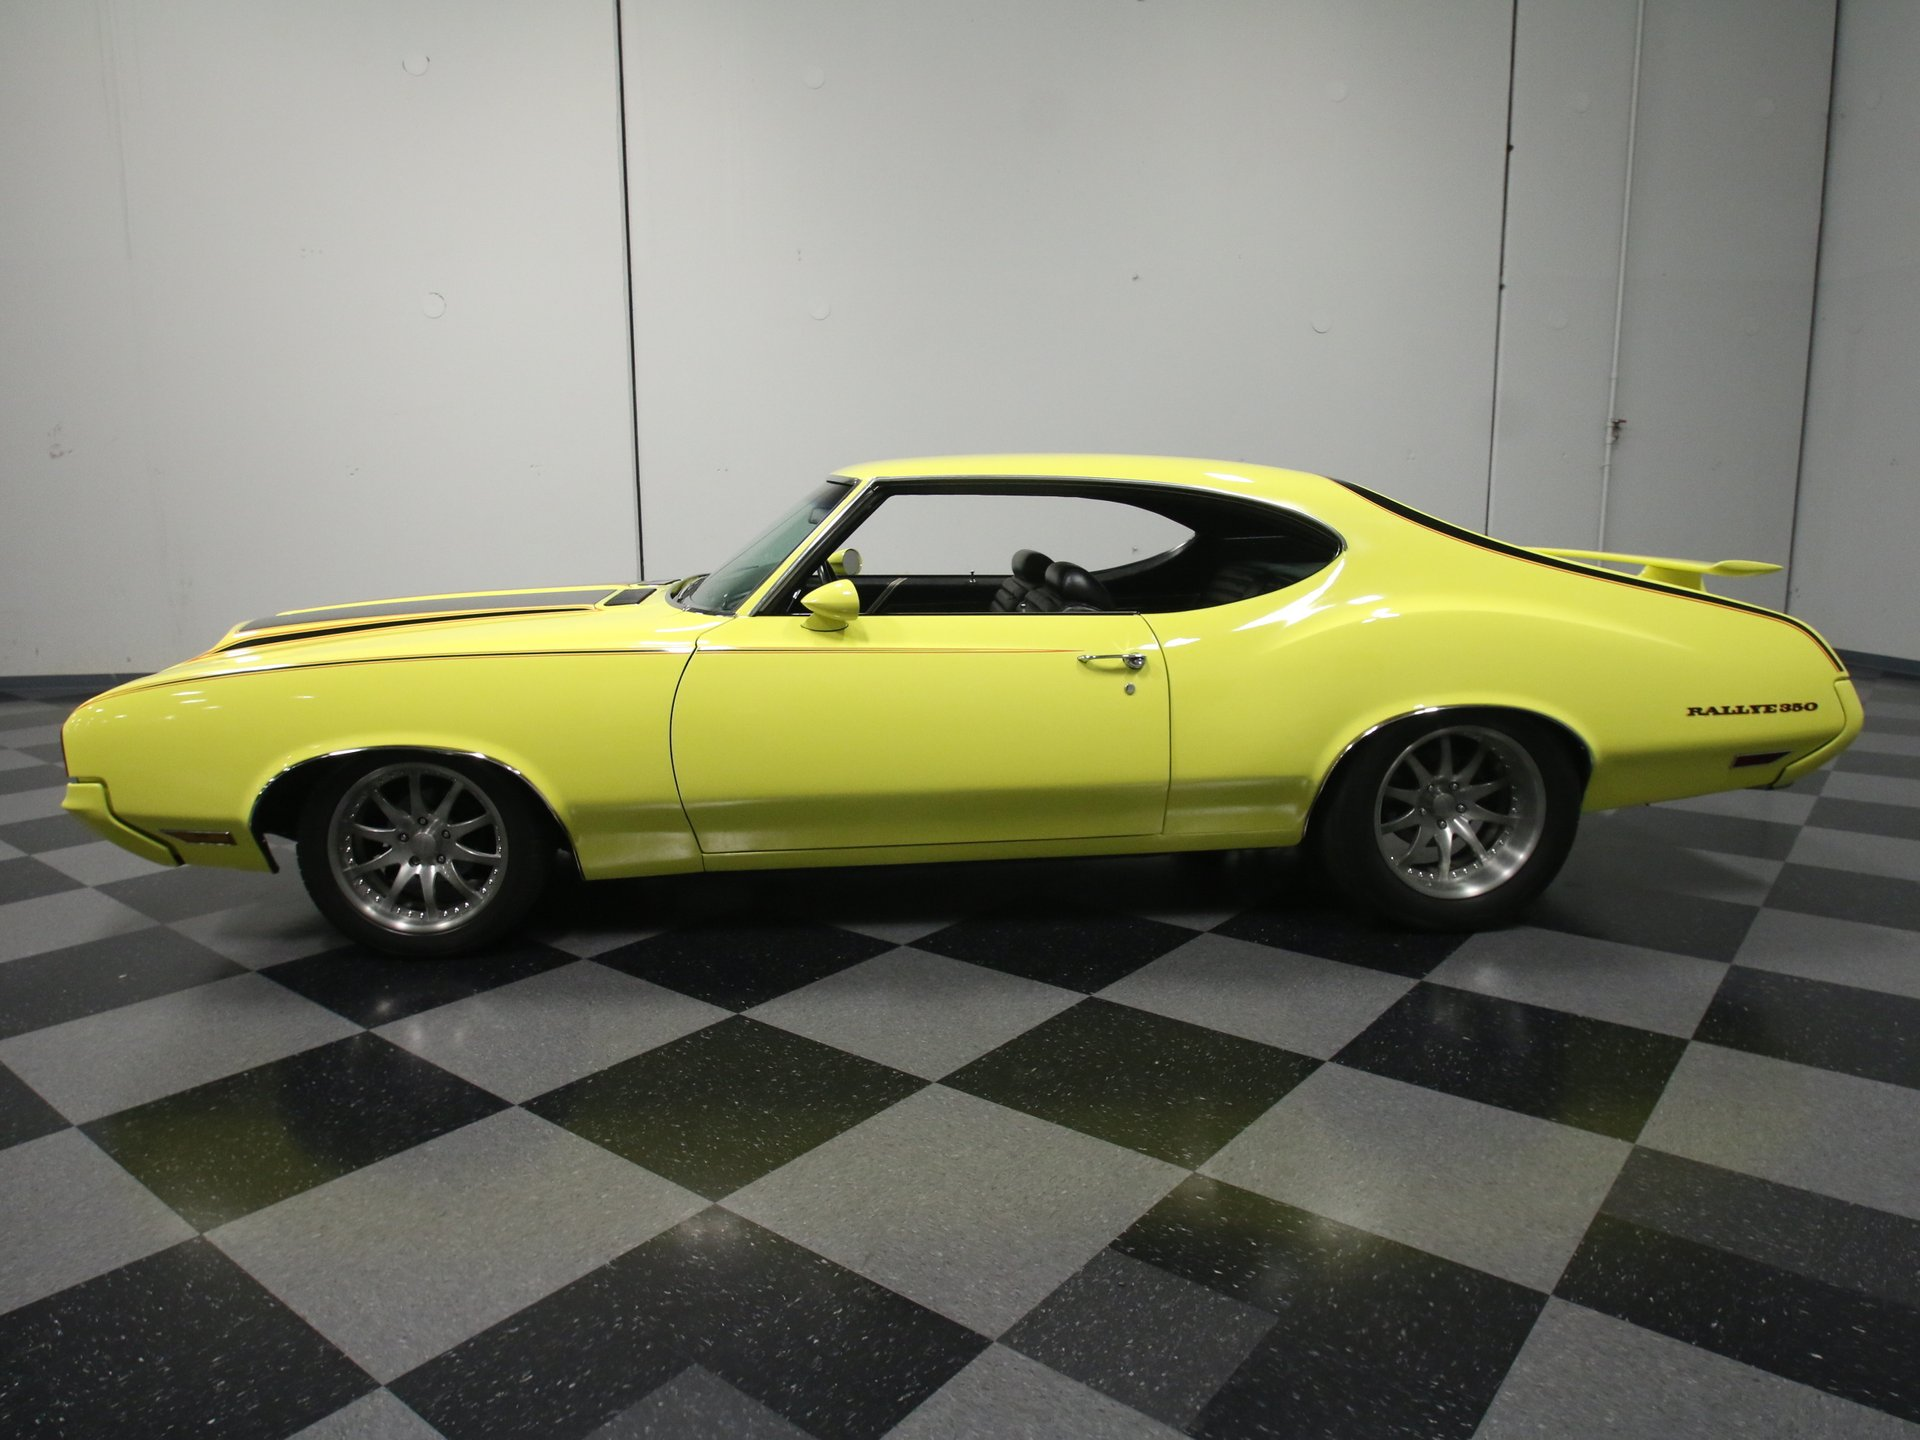 1970 oldsmobile cutlass rallye 350 tribute